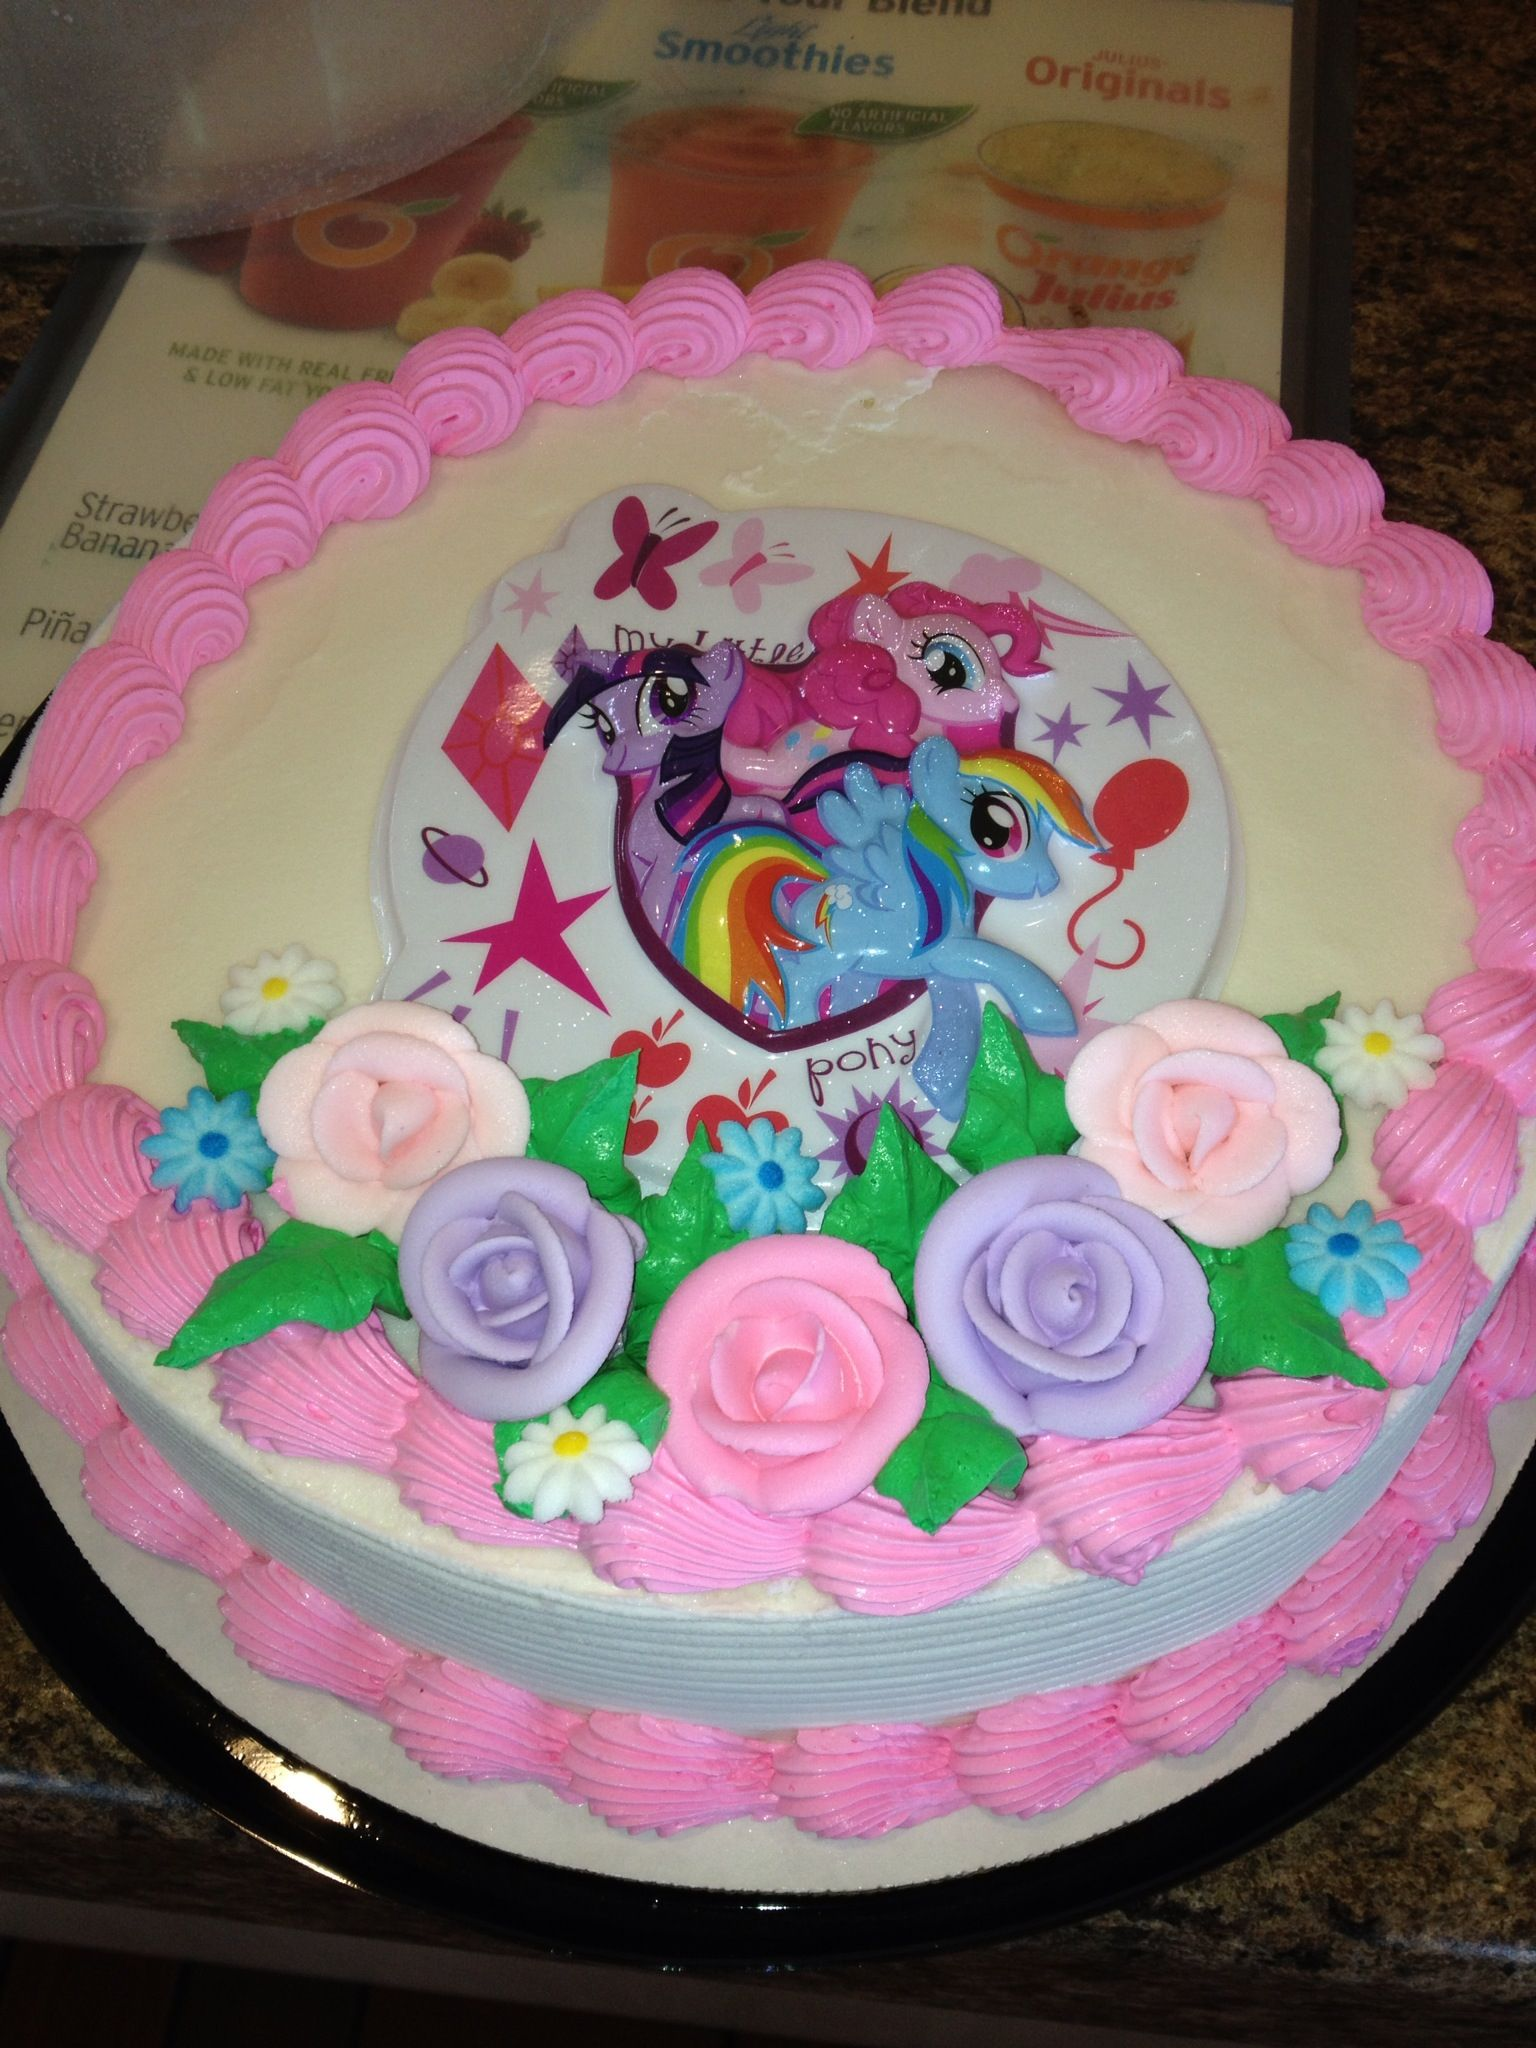 Strange Dq Cakes Dairy Queen My Little Pony Ice Cream Cake Funny Birthday Cards Online Fluifree Goldxyz